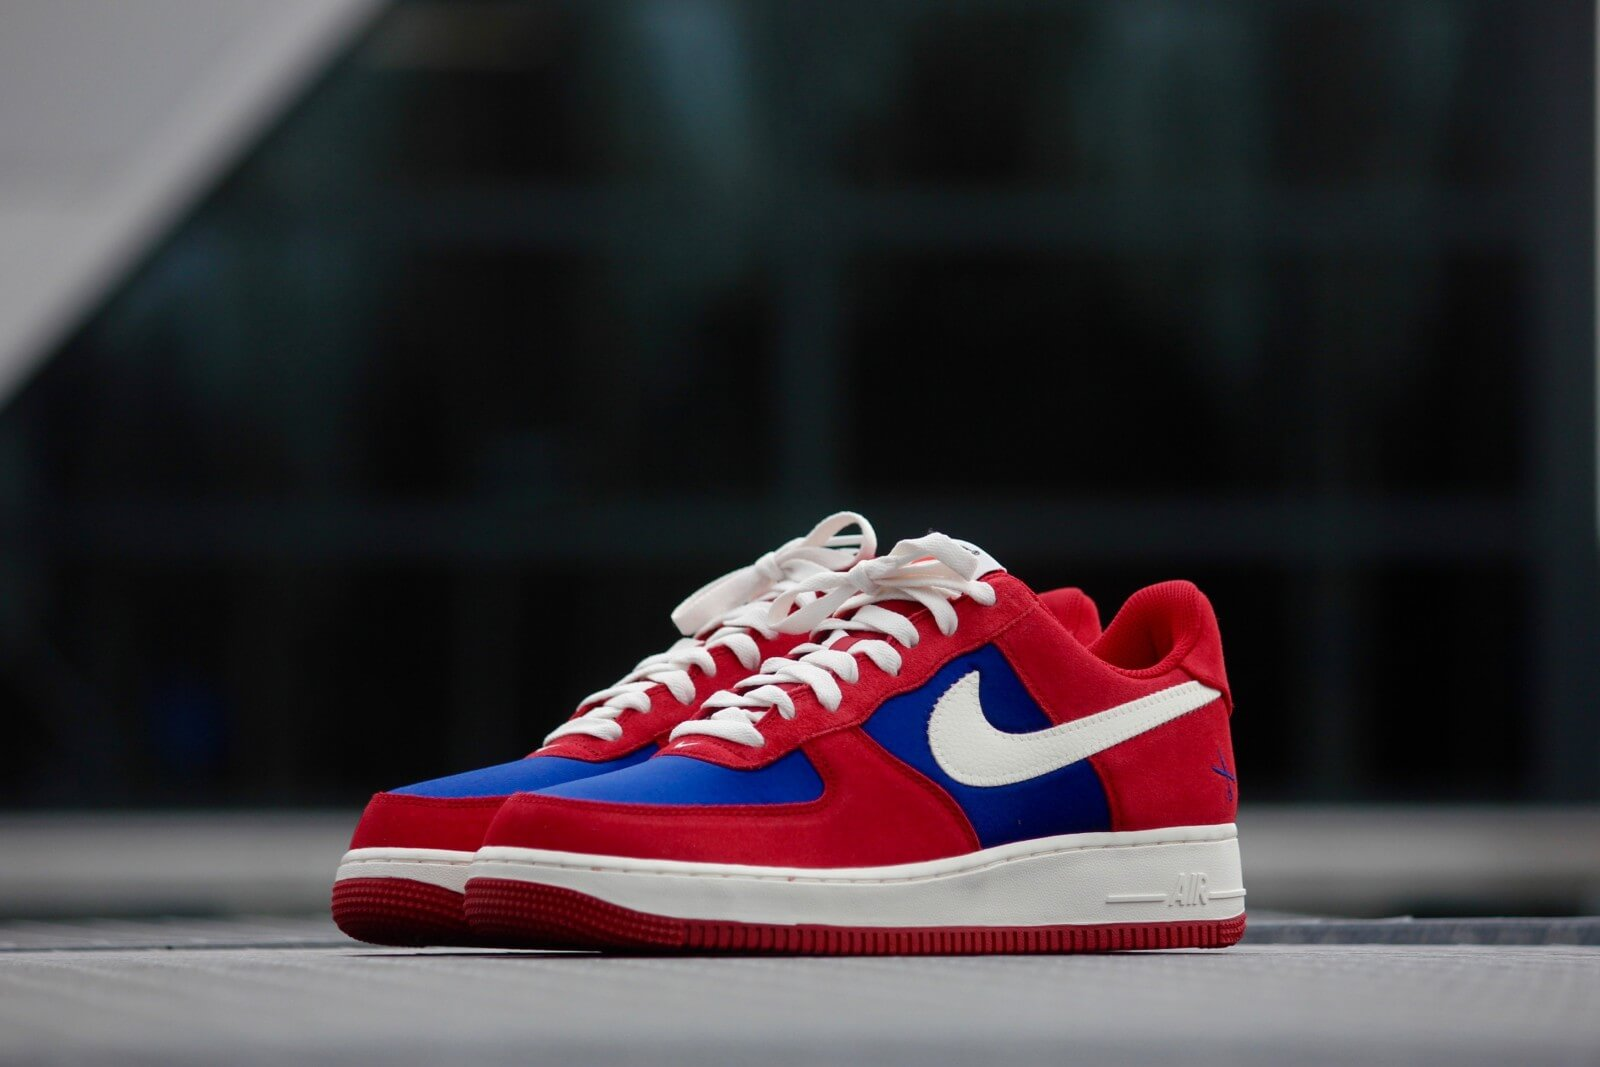 Nike Air Force 1 Gym Red Sail Deep Royal Blue 488298 626